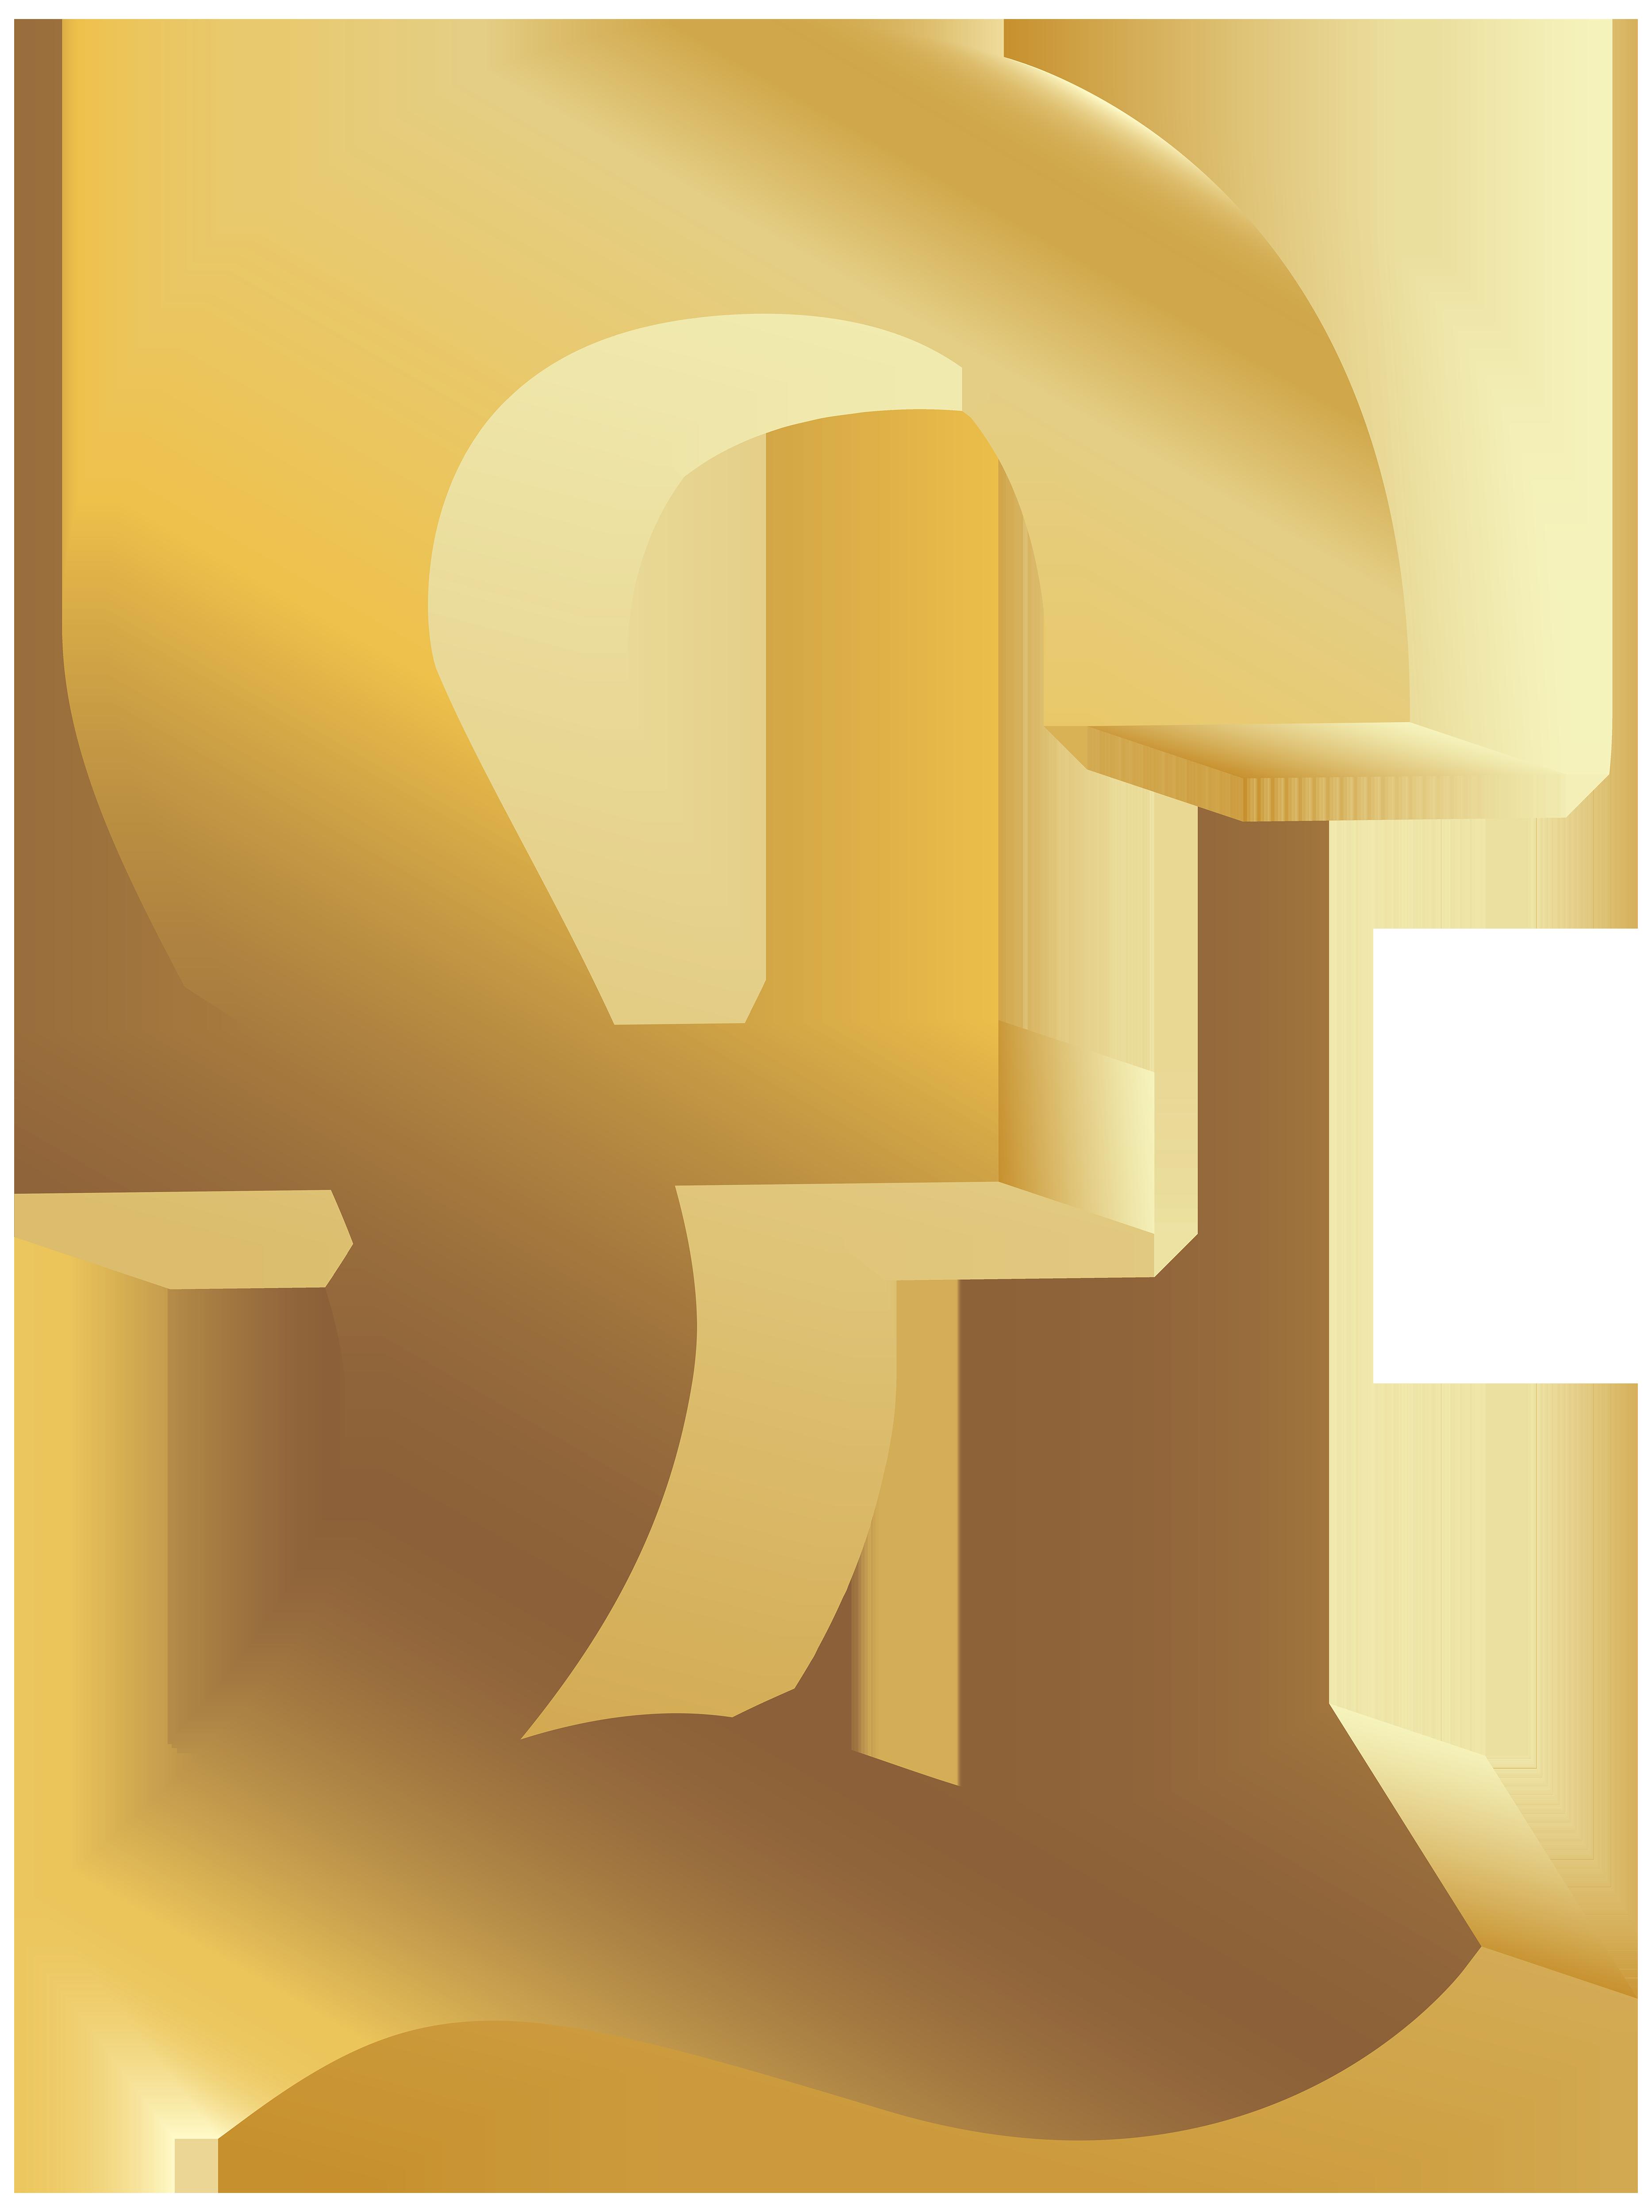 Money symbols clipart svg library download Pound Symbol PNG Clip Art - Best WEB Clipart svg library download